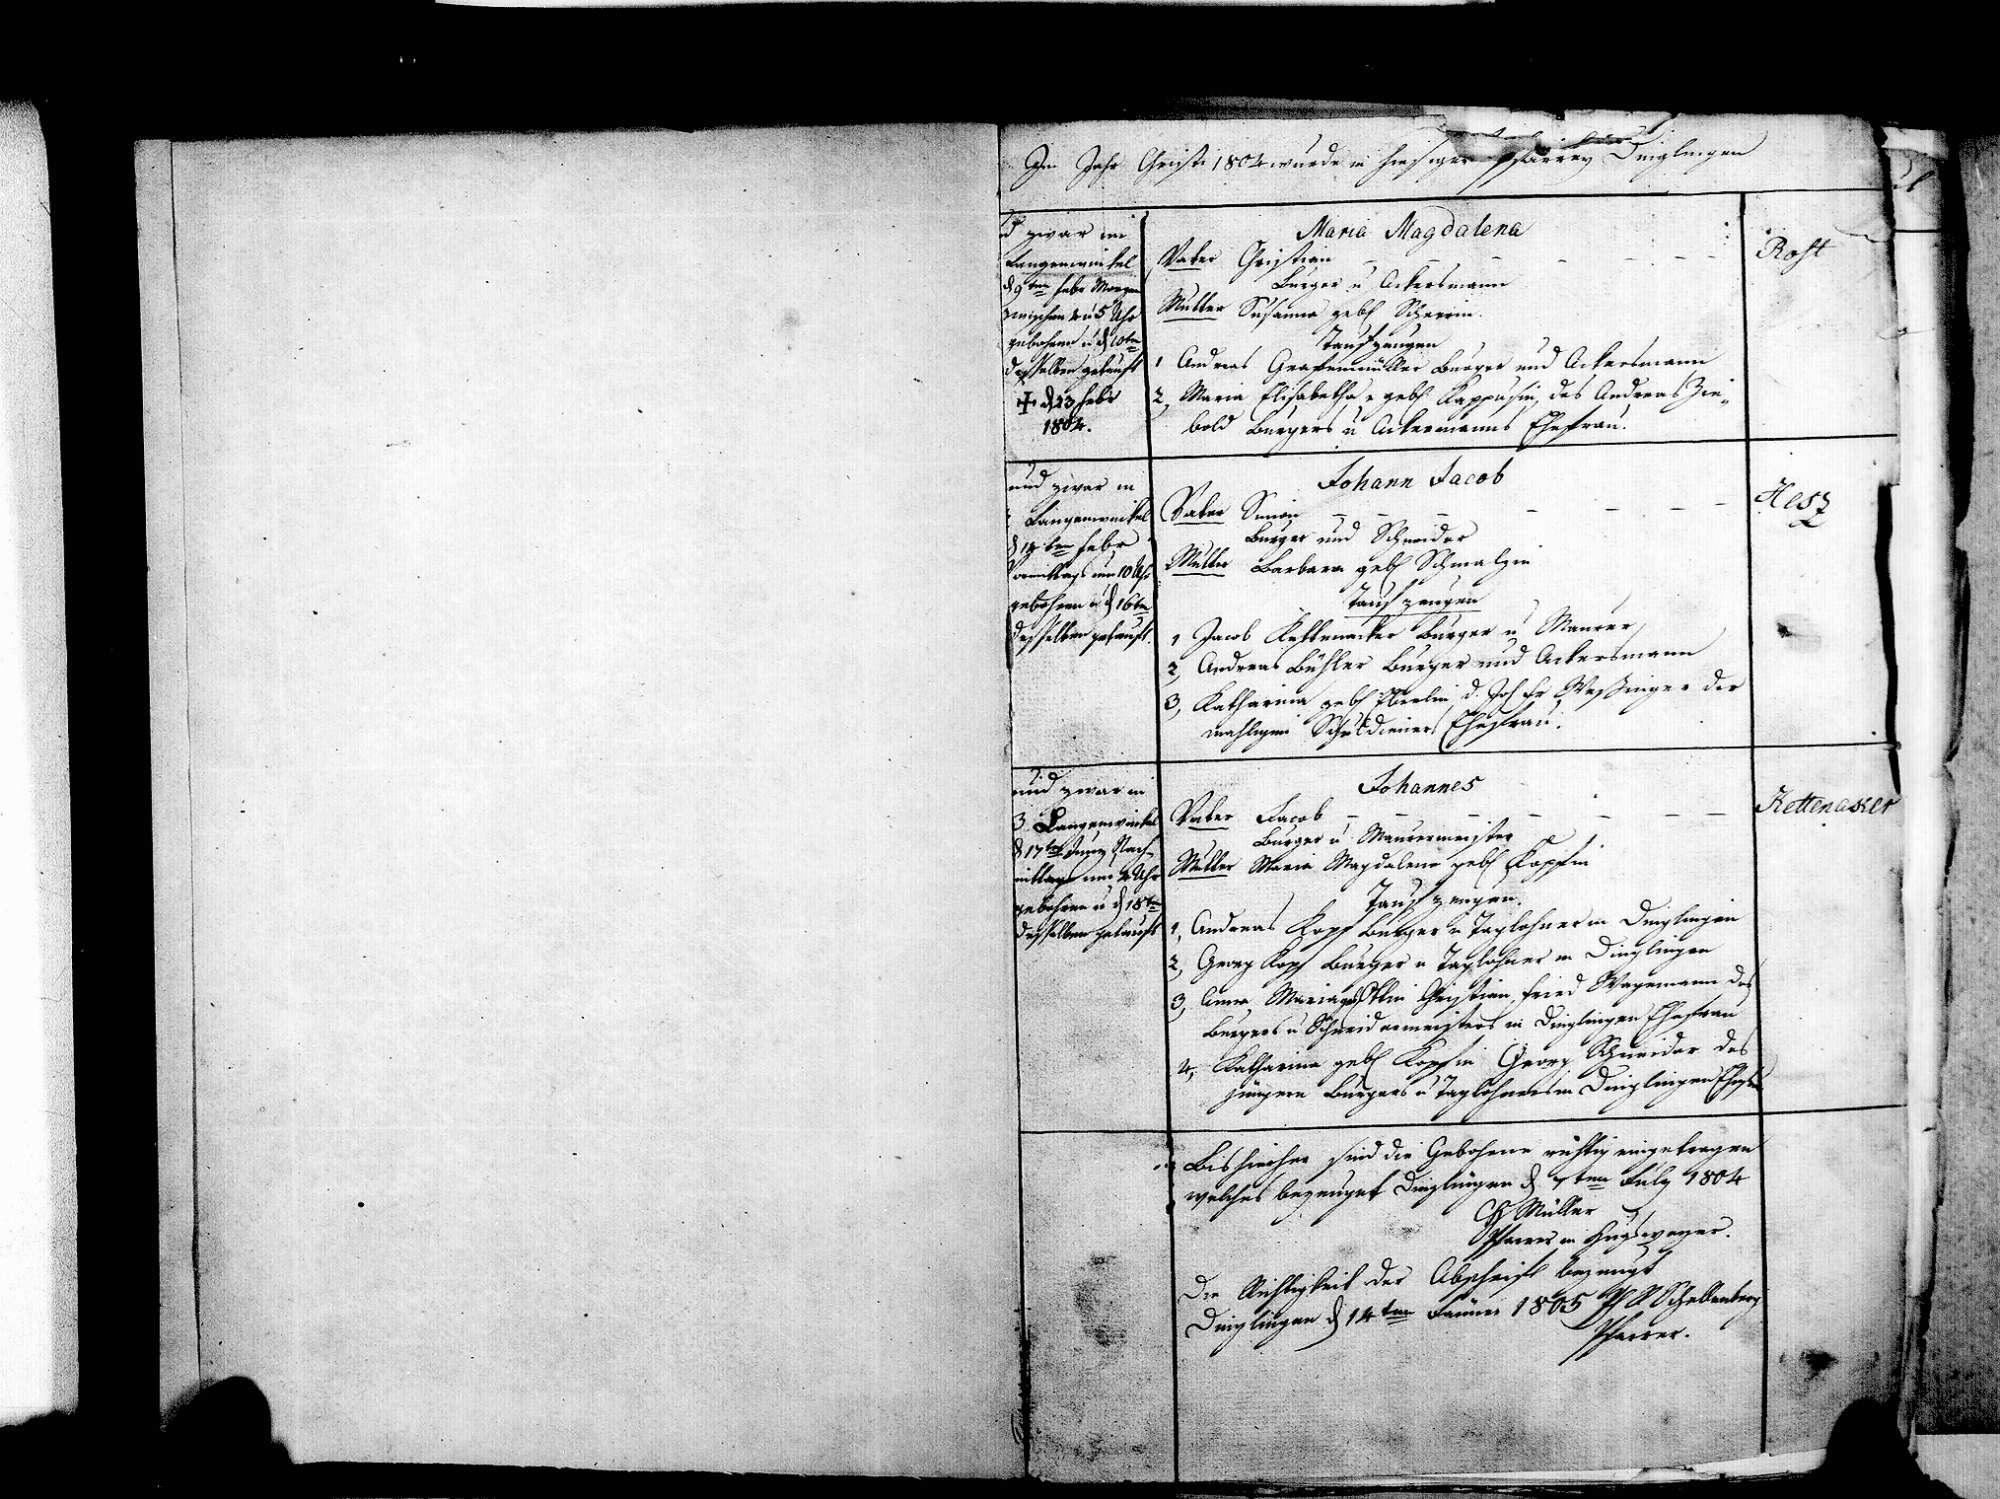 Langenwinkel, Lahr im Schwarzwald OG; Evangelische Gemeinde: Standesbuch 1804-1869 Langenwinkel, Lahr im Schwarzwald OG; Katholische Gemeinde: Standesbuch 1804-1869, Bild 3